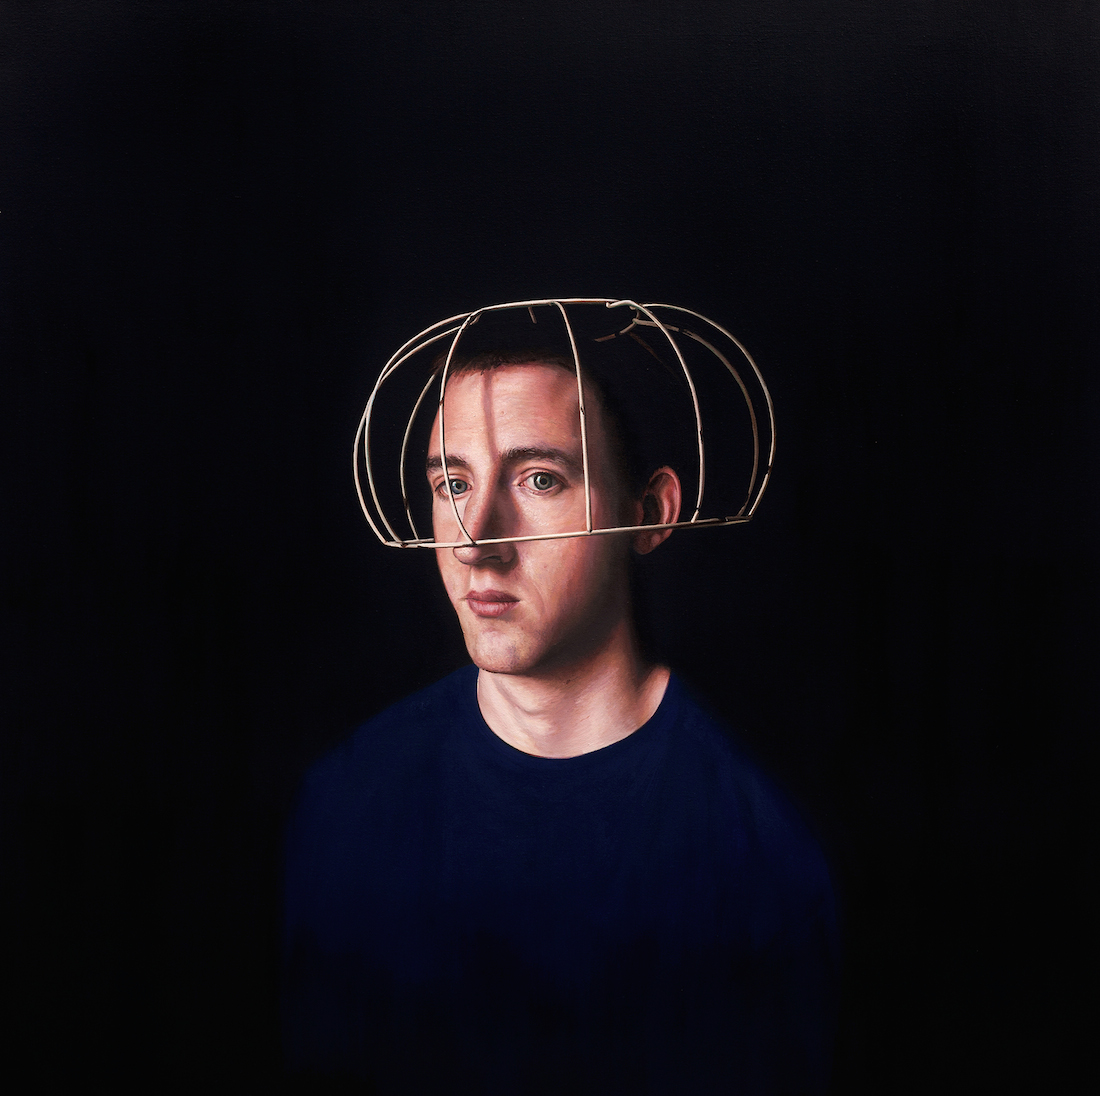 Title: The Artist Medium: oil Size: 90cm x 90cm